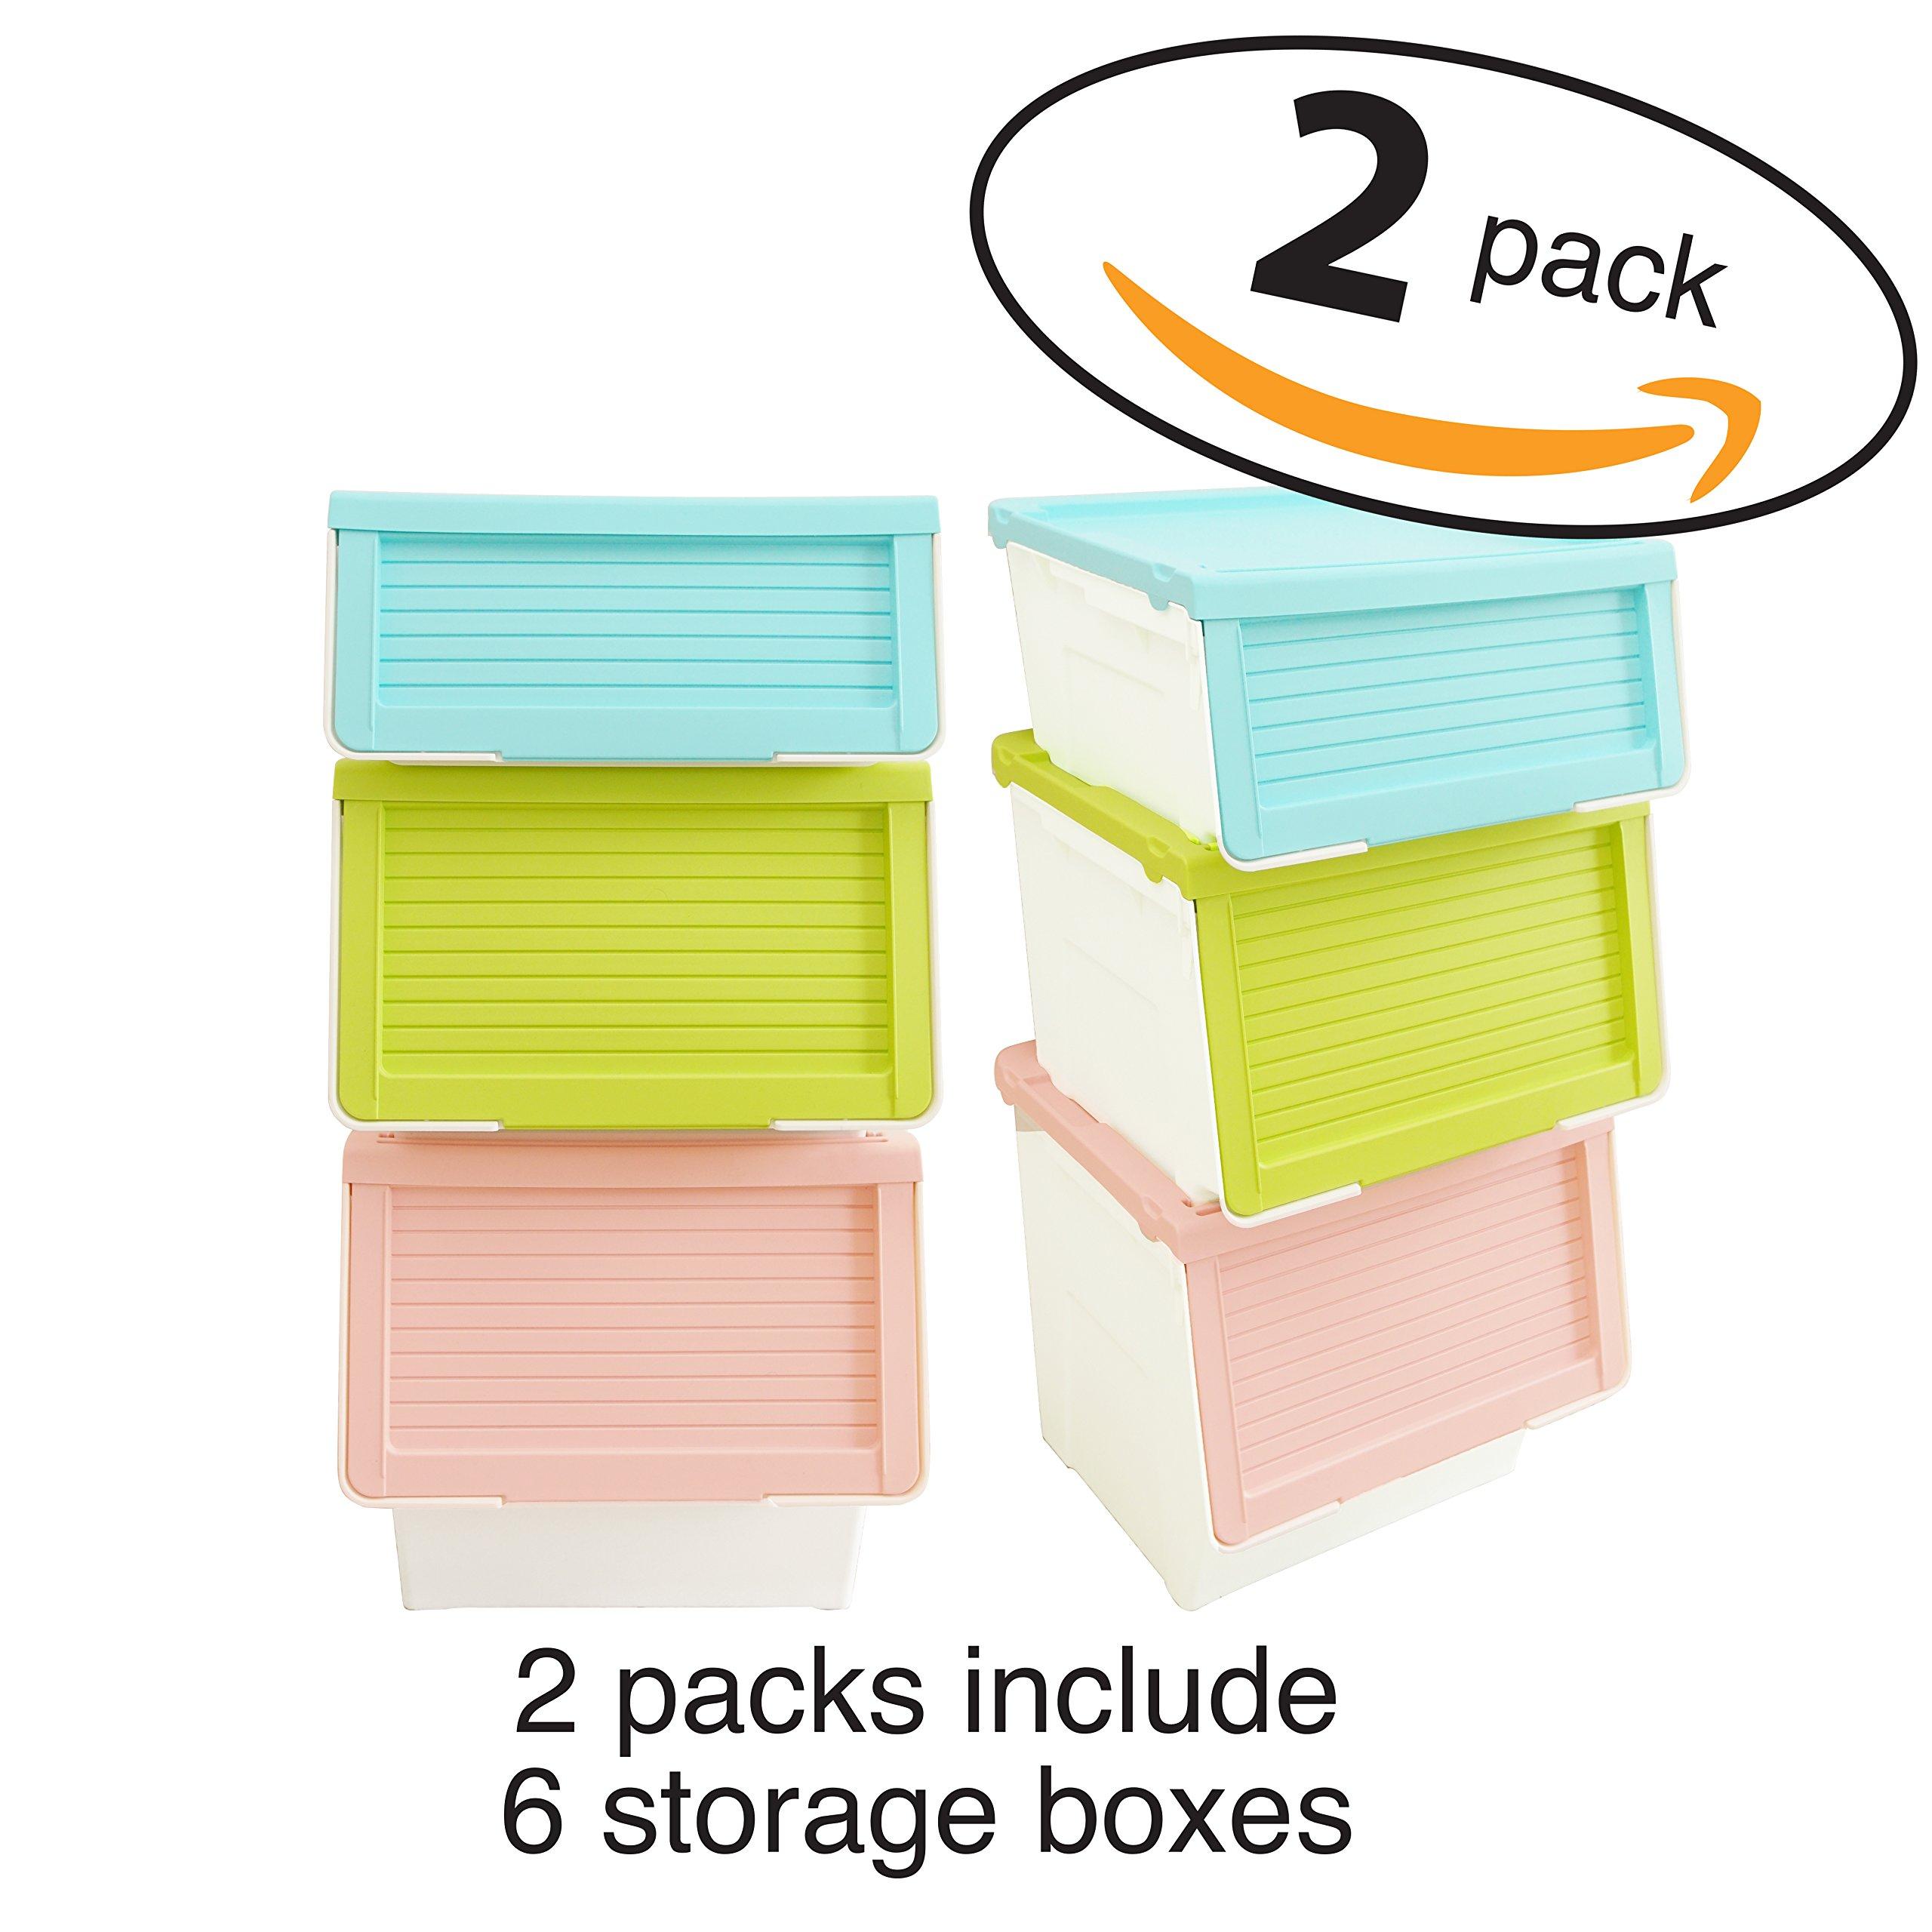 LuxorWare 3 Piece Storage Bins home Organizer for Kids Toys, Clothes & Kitchen food (Blue(S), Pink(M), Green(L)x2)